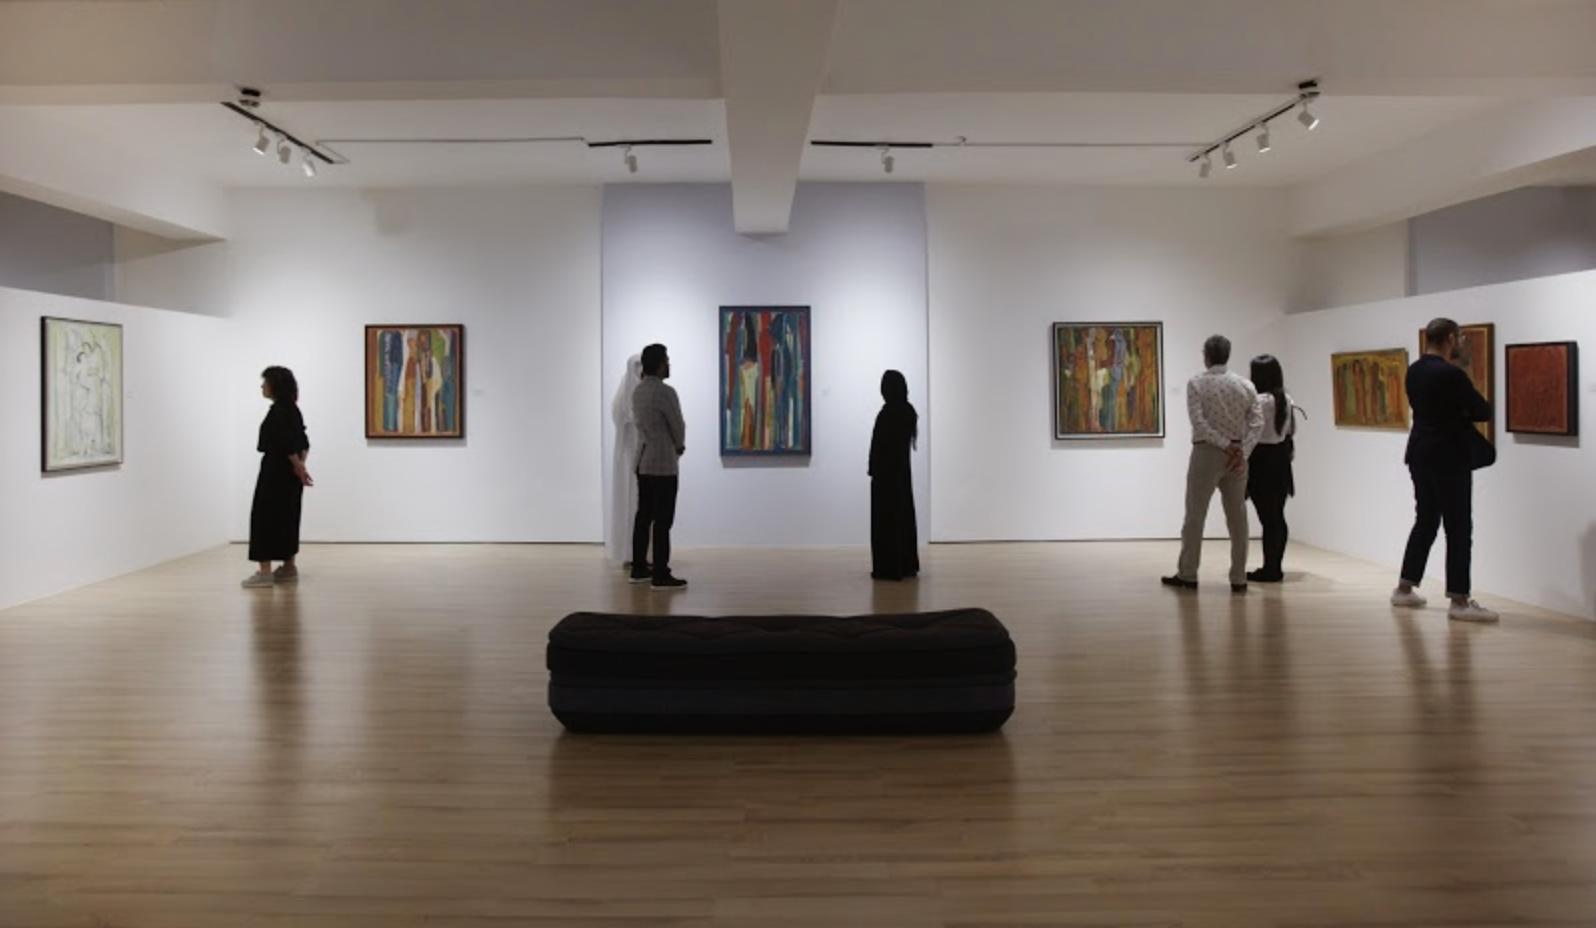 Installation view. Paul Guiragossian: Testimonies of Existence. Image courtesy of Barjeel Art Foundation.